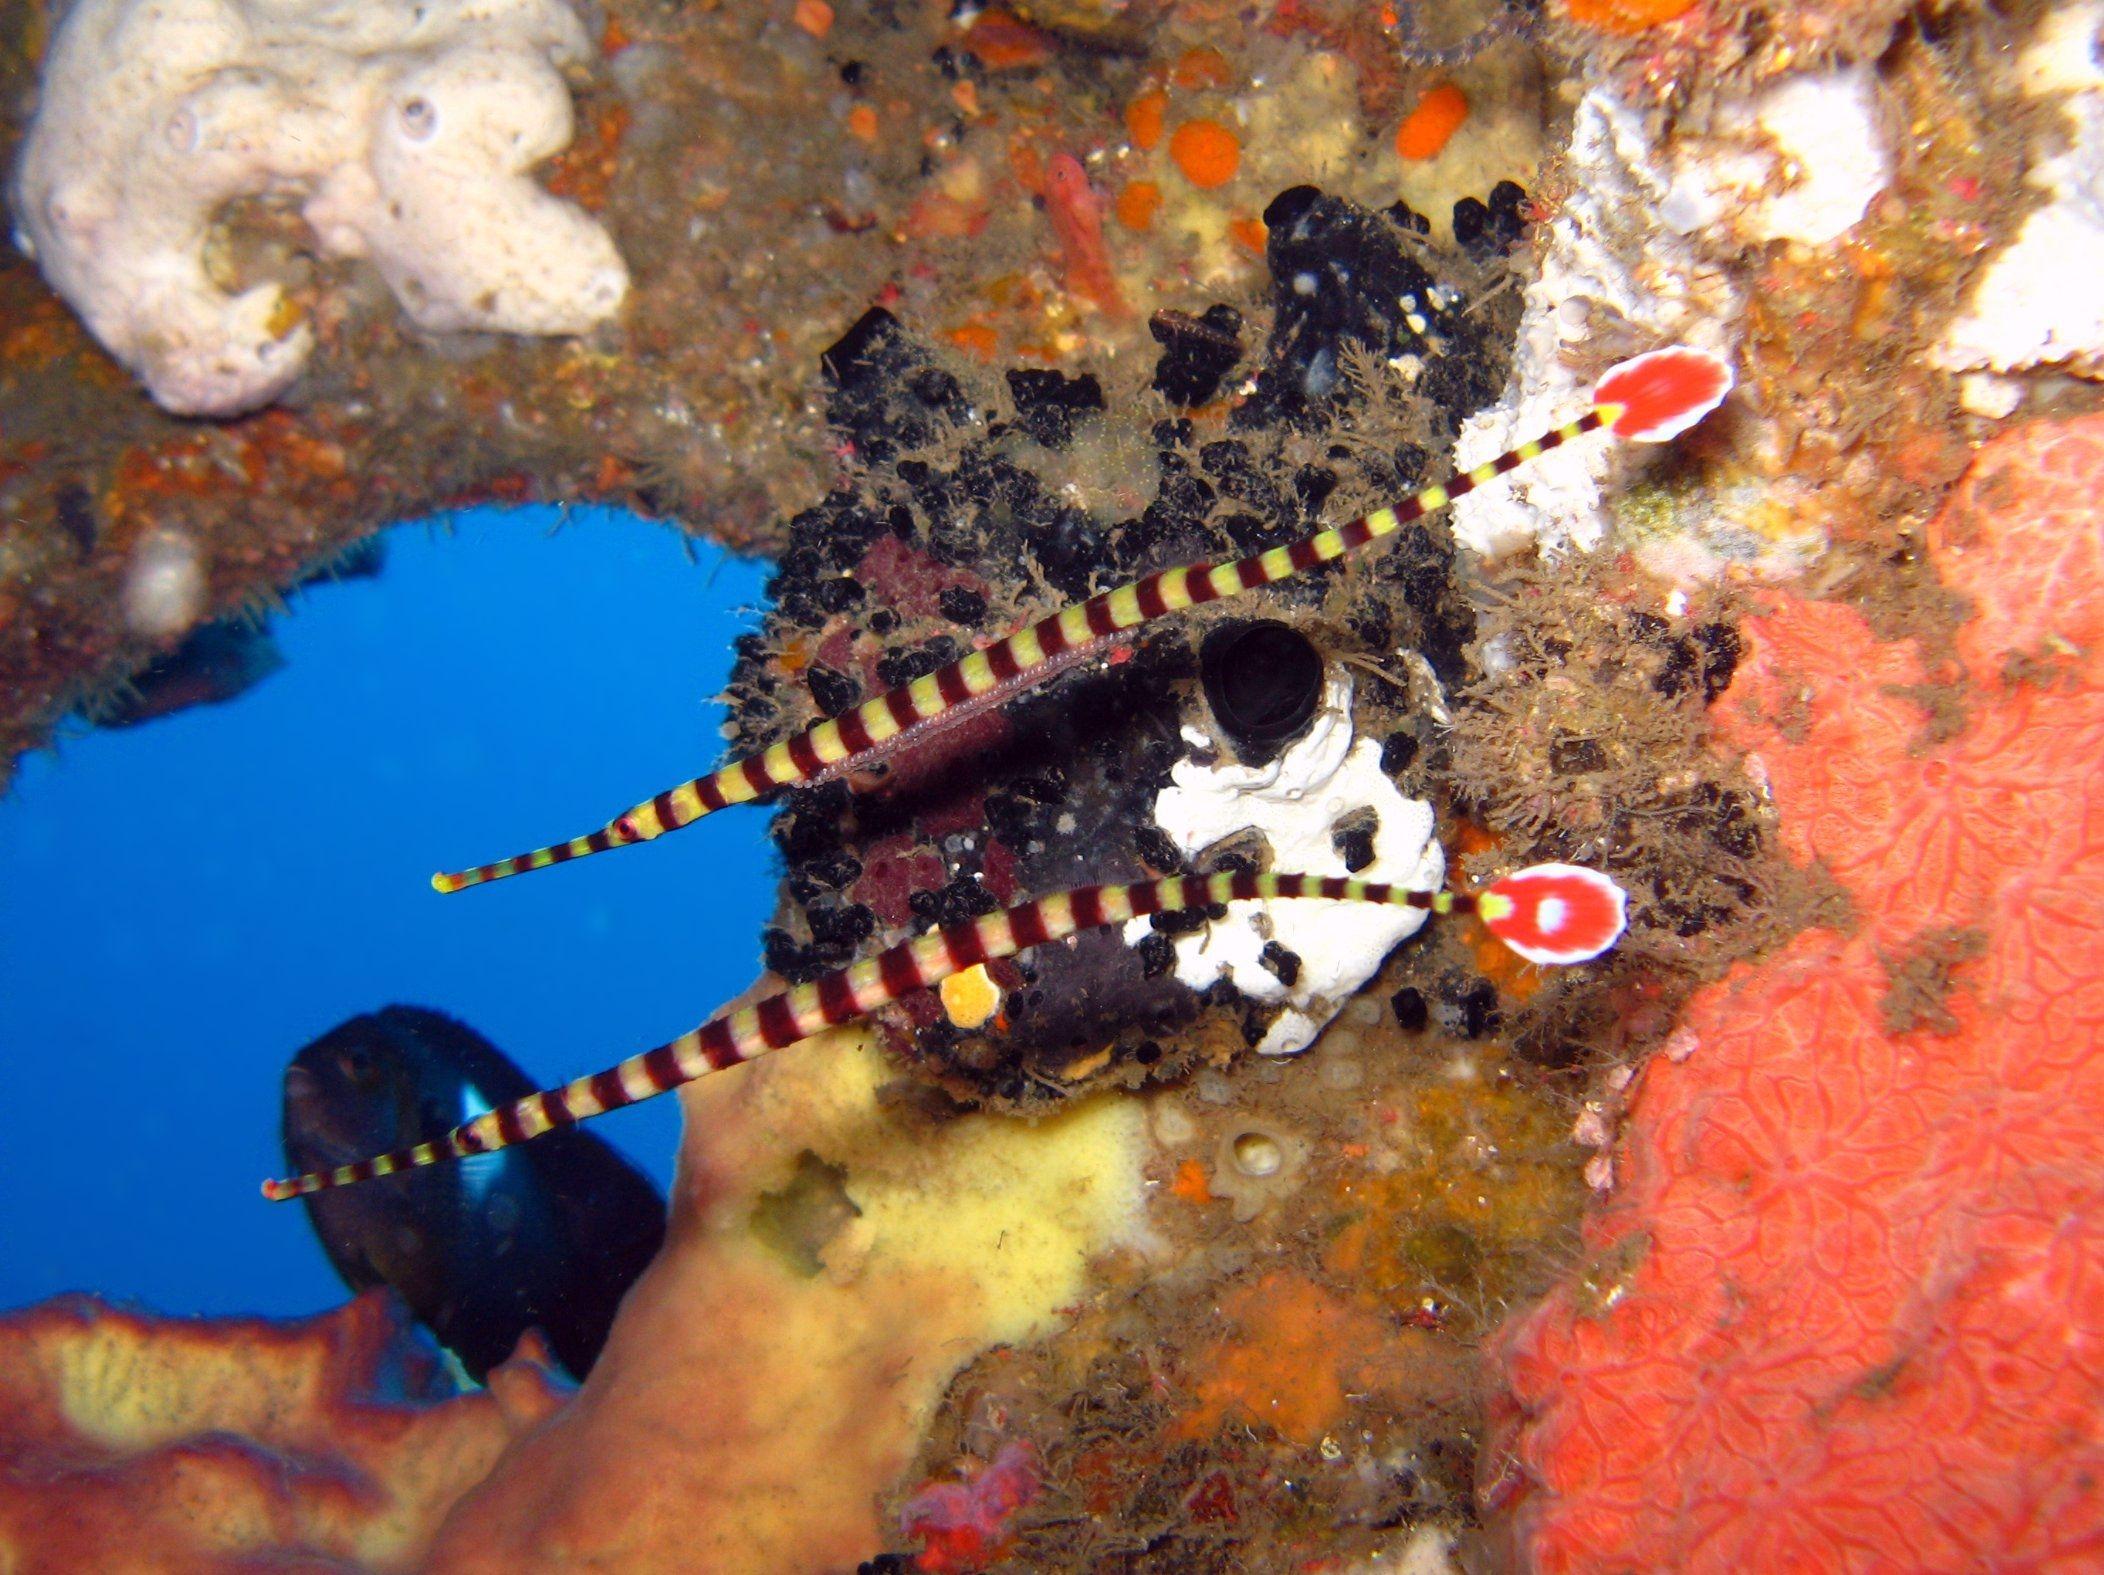 Broadbanded Pipefish (Dunckerocampus dactyliophorus